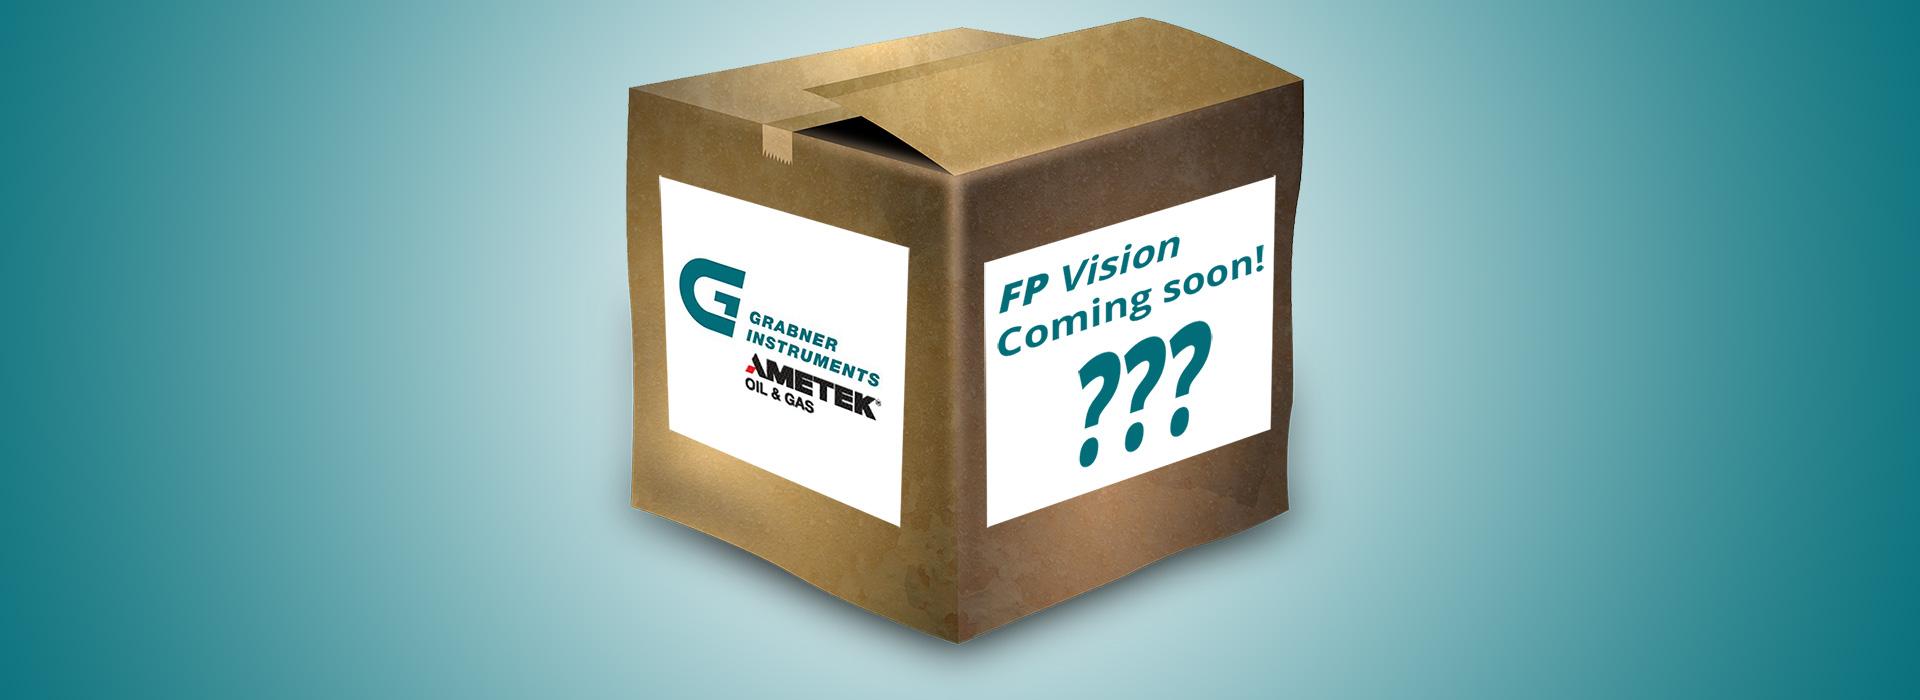 Grabner FP Vision coming soon…